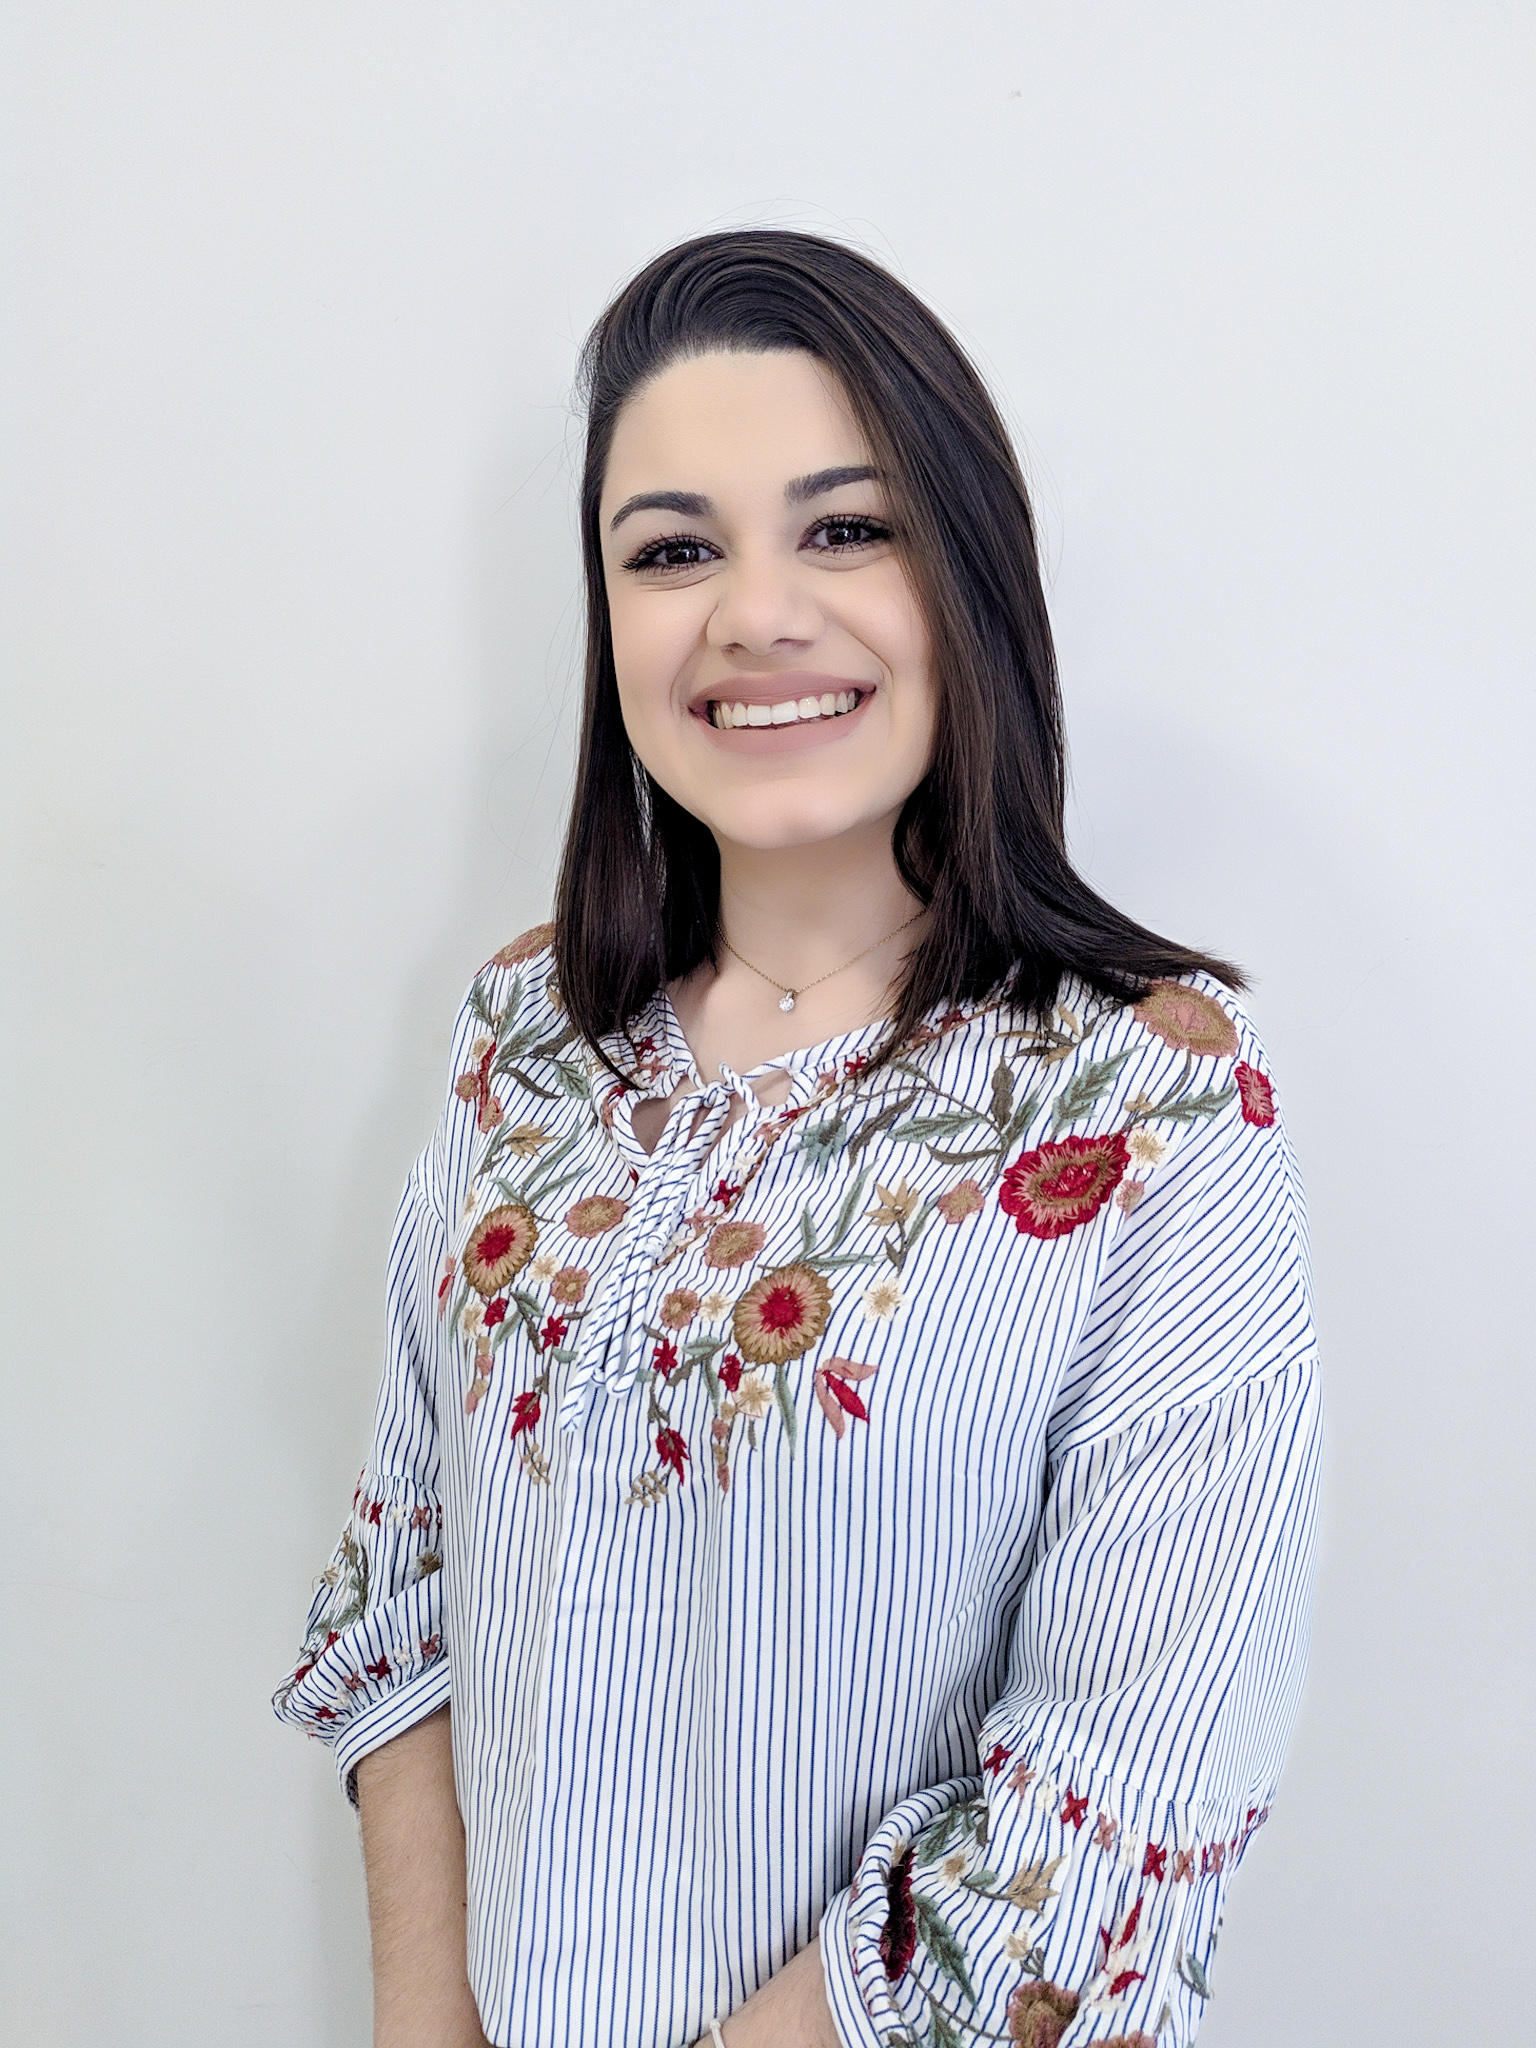 Monique Ellen Pimentel Cruz